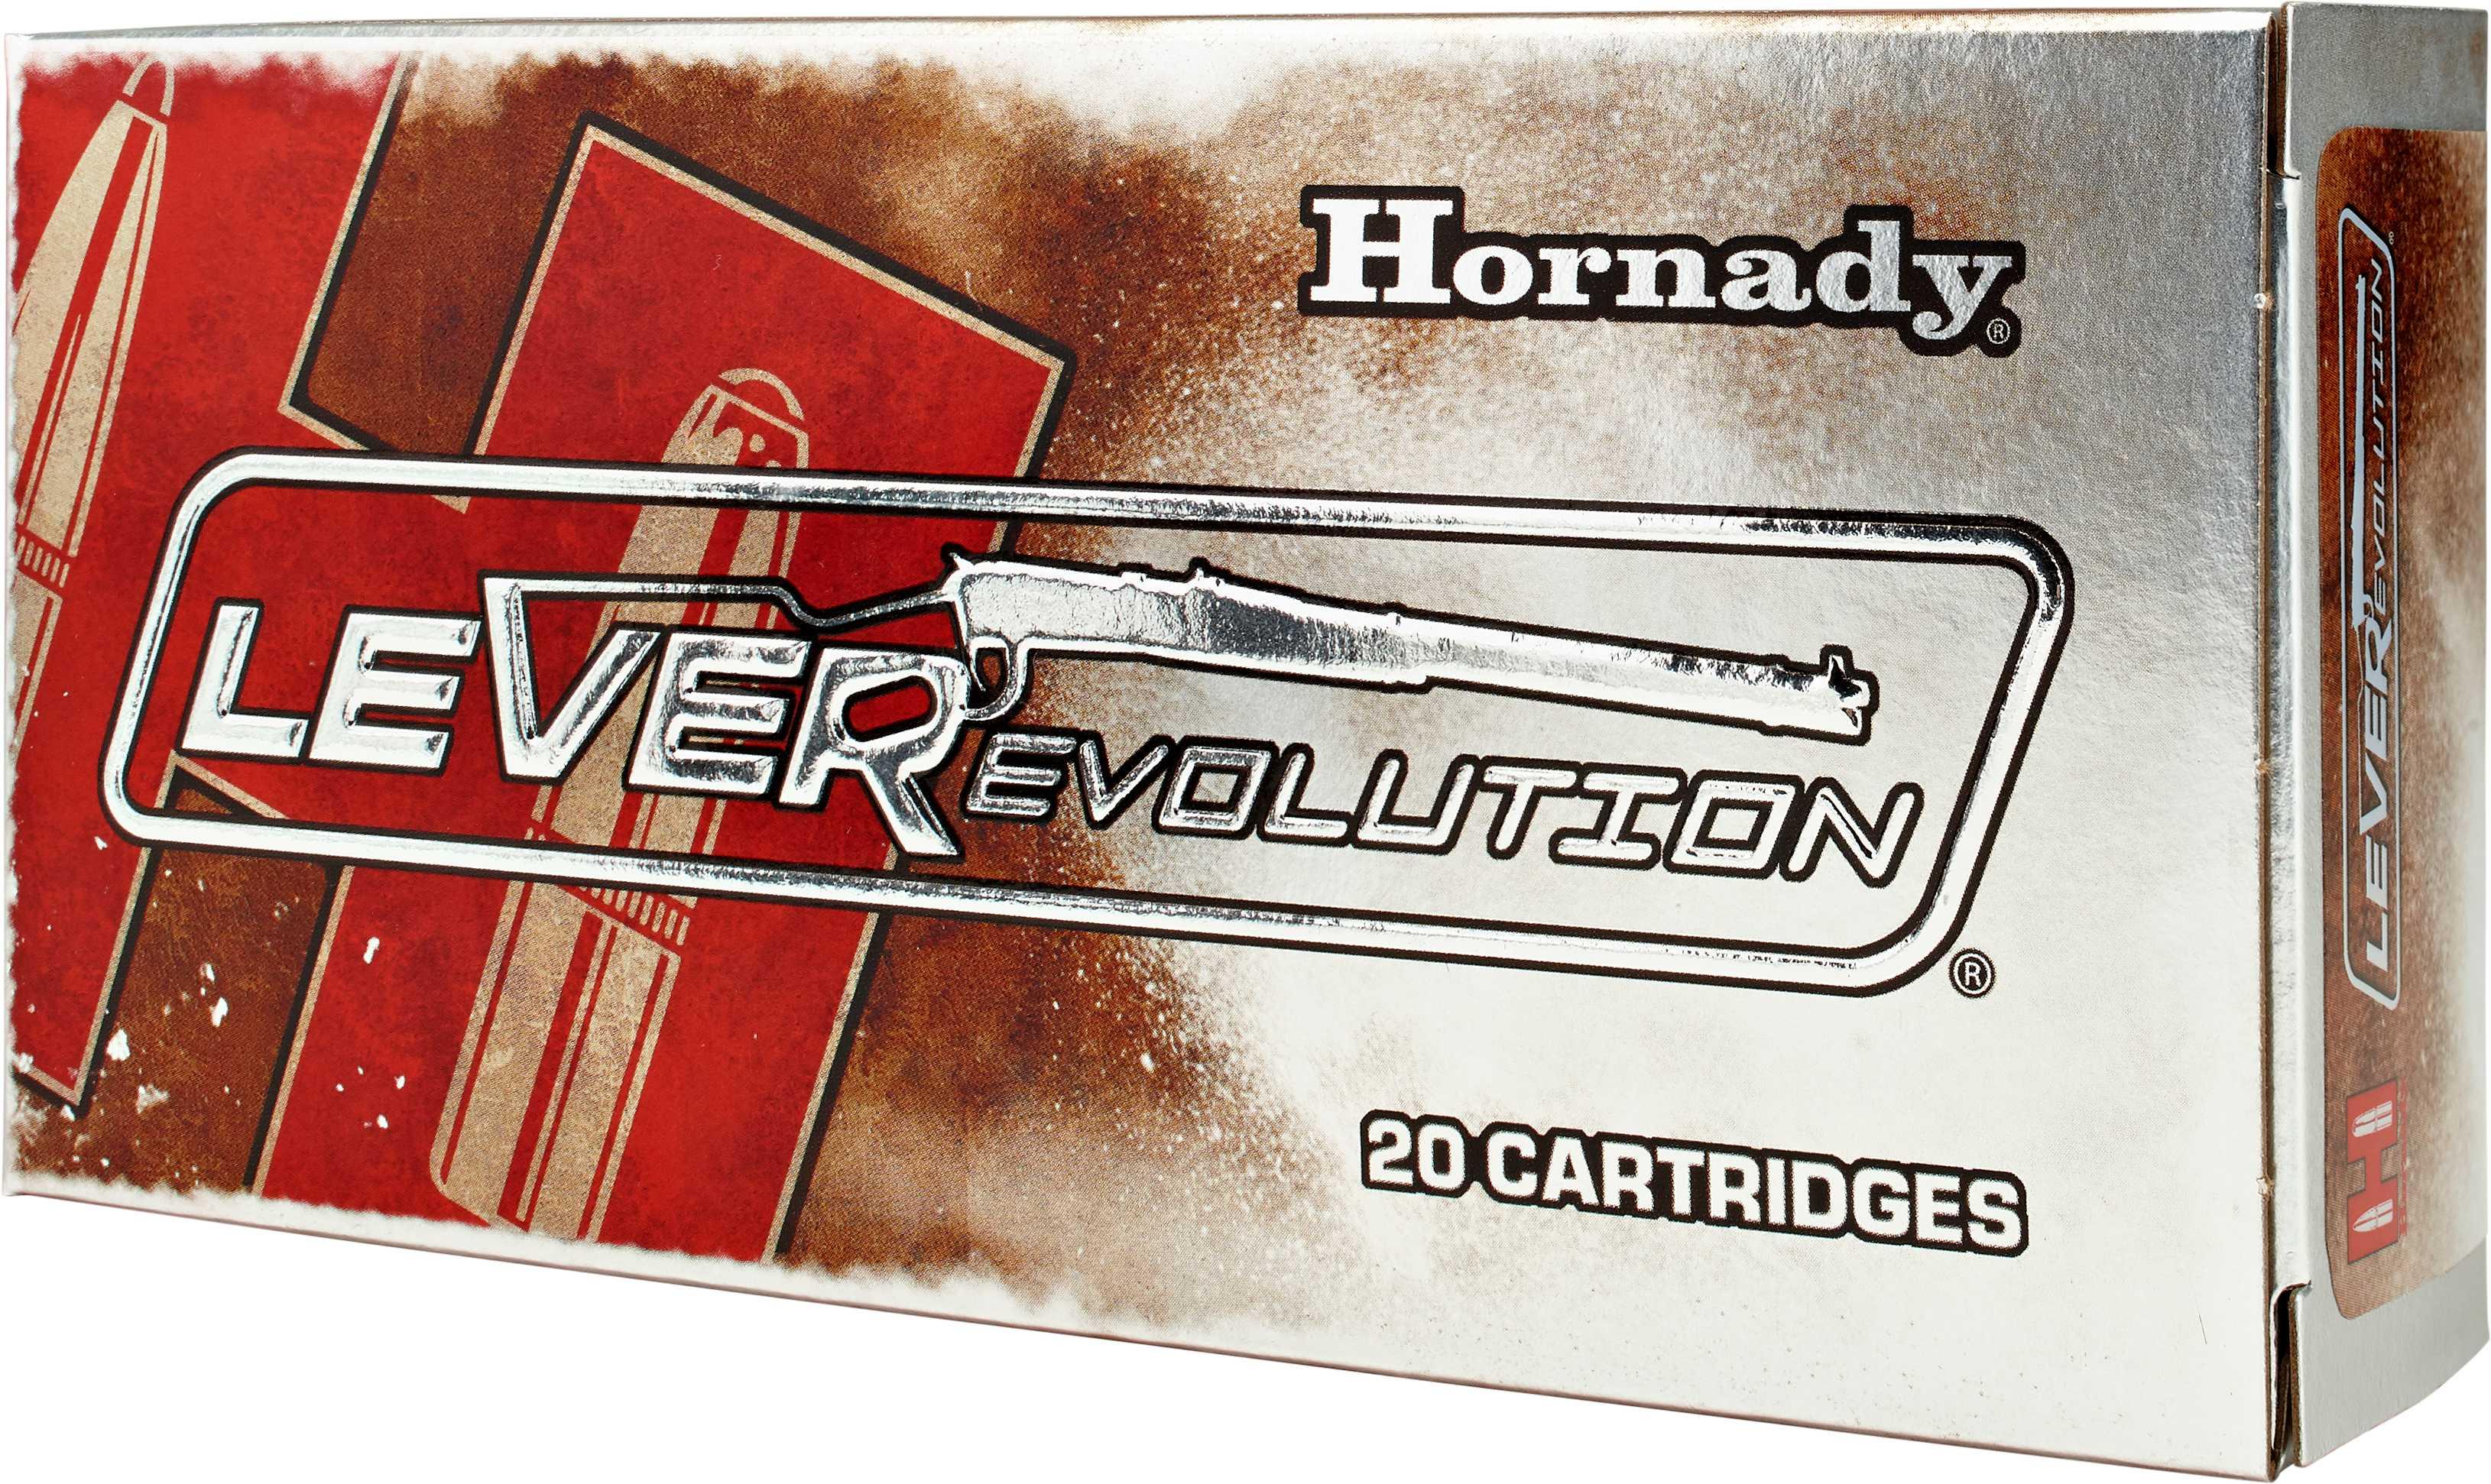 Hornady Leverevolution 444 Marlin 265 Grain FlexTip 20 Rounds Ammunition 82744 (Per 20) Md: 82744